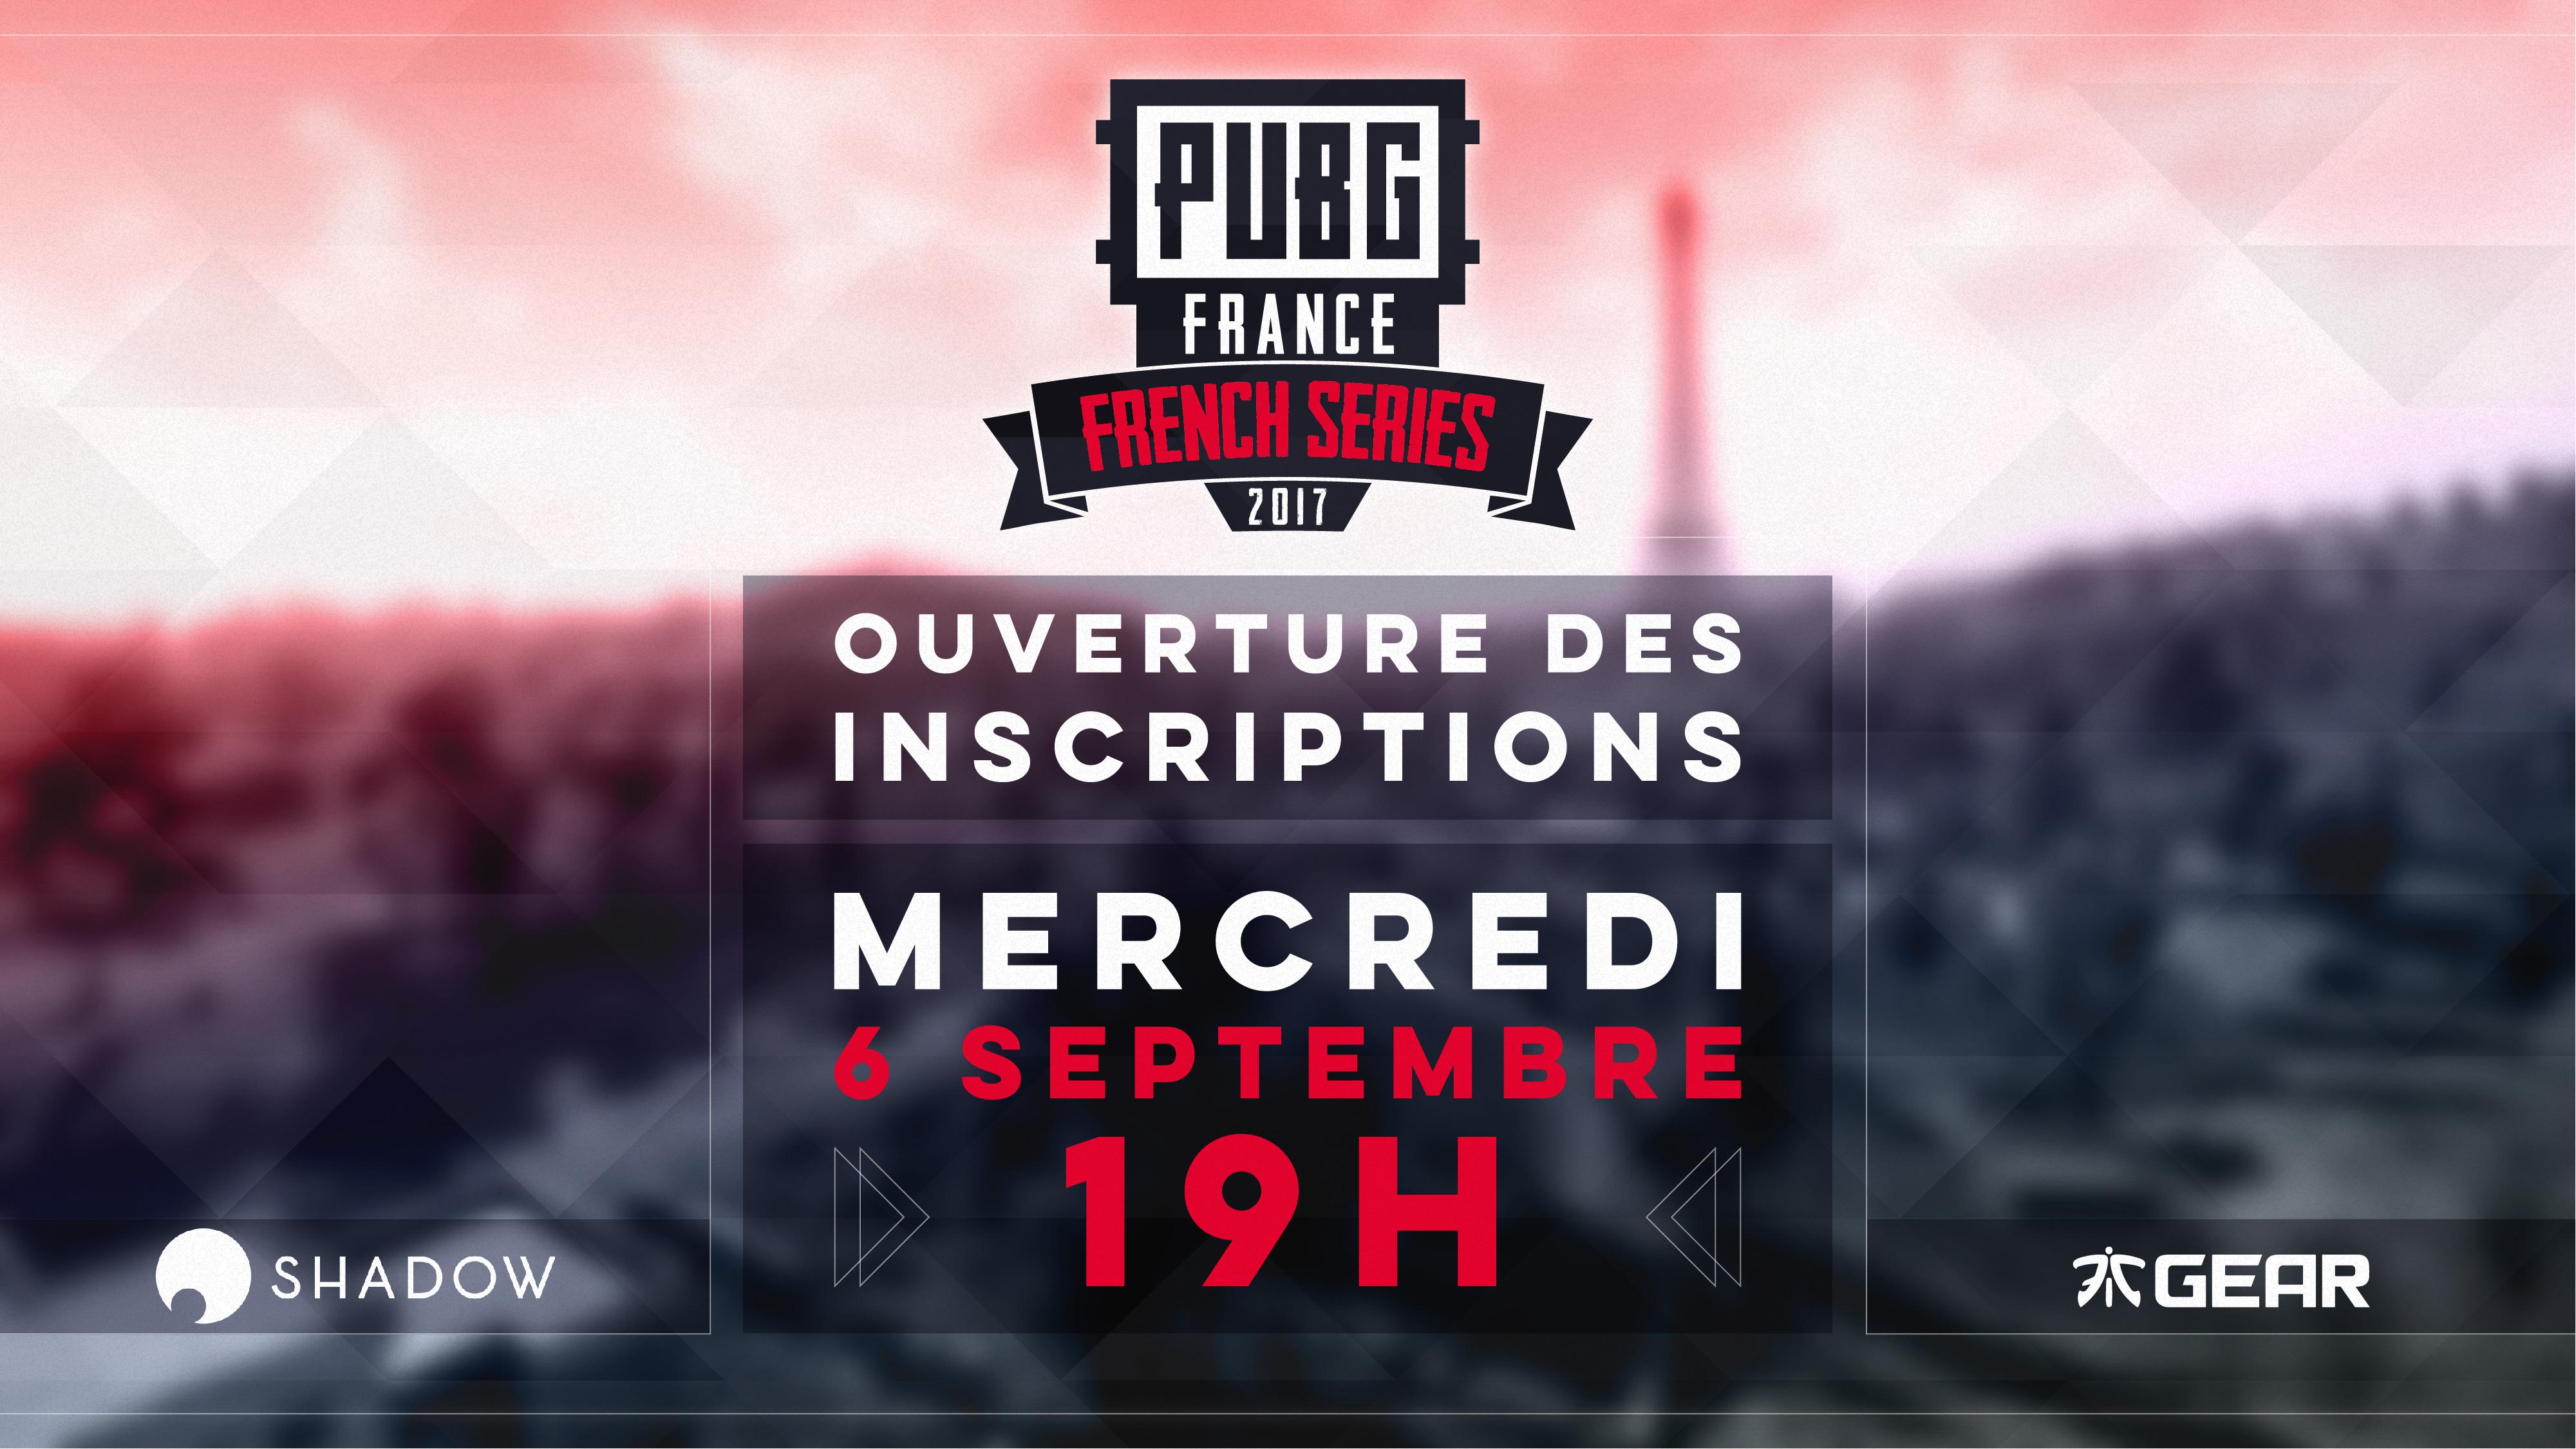 PUBG_France_-_Tournoi_FS2017_-_Annonce_i